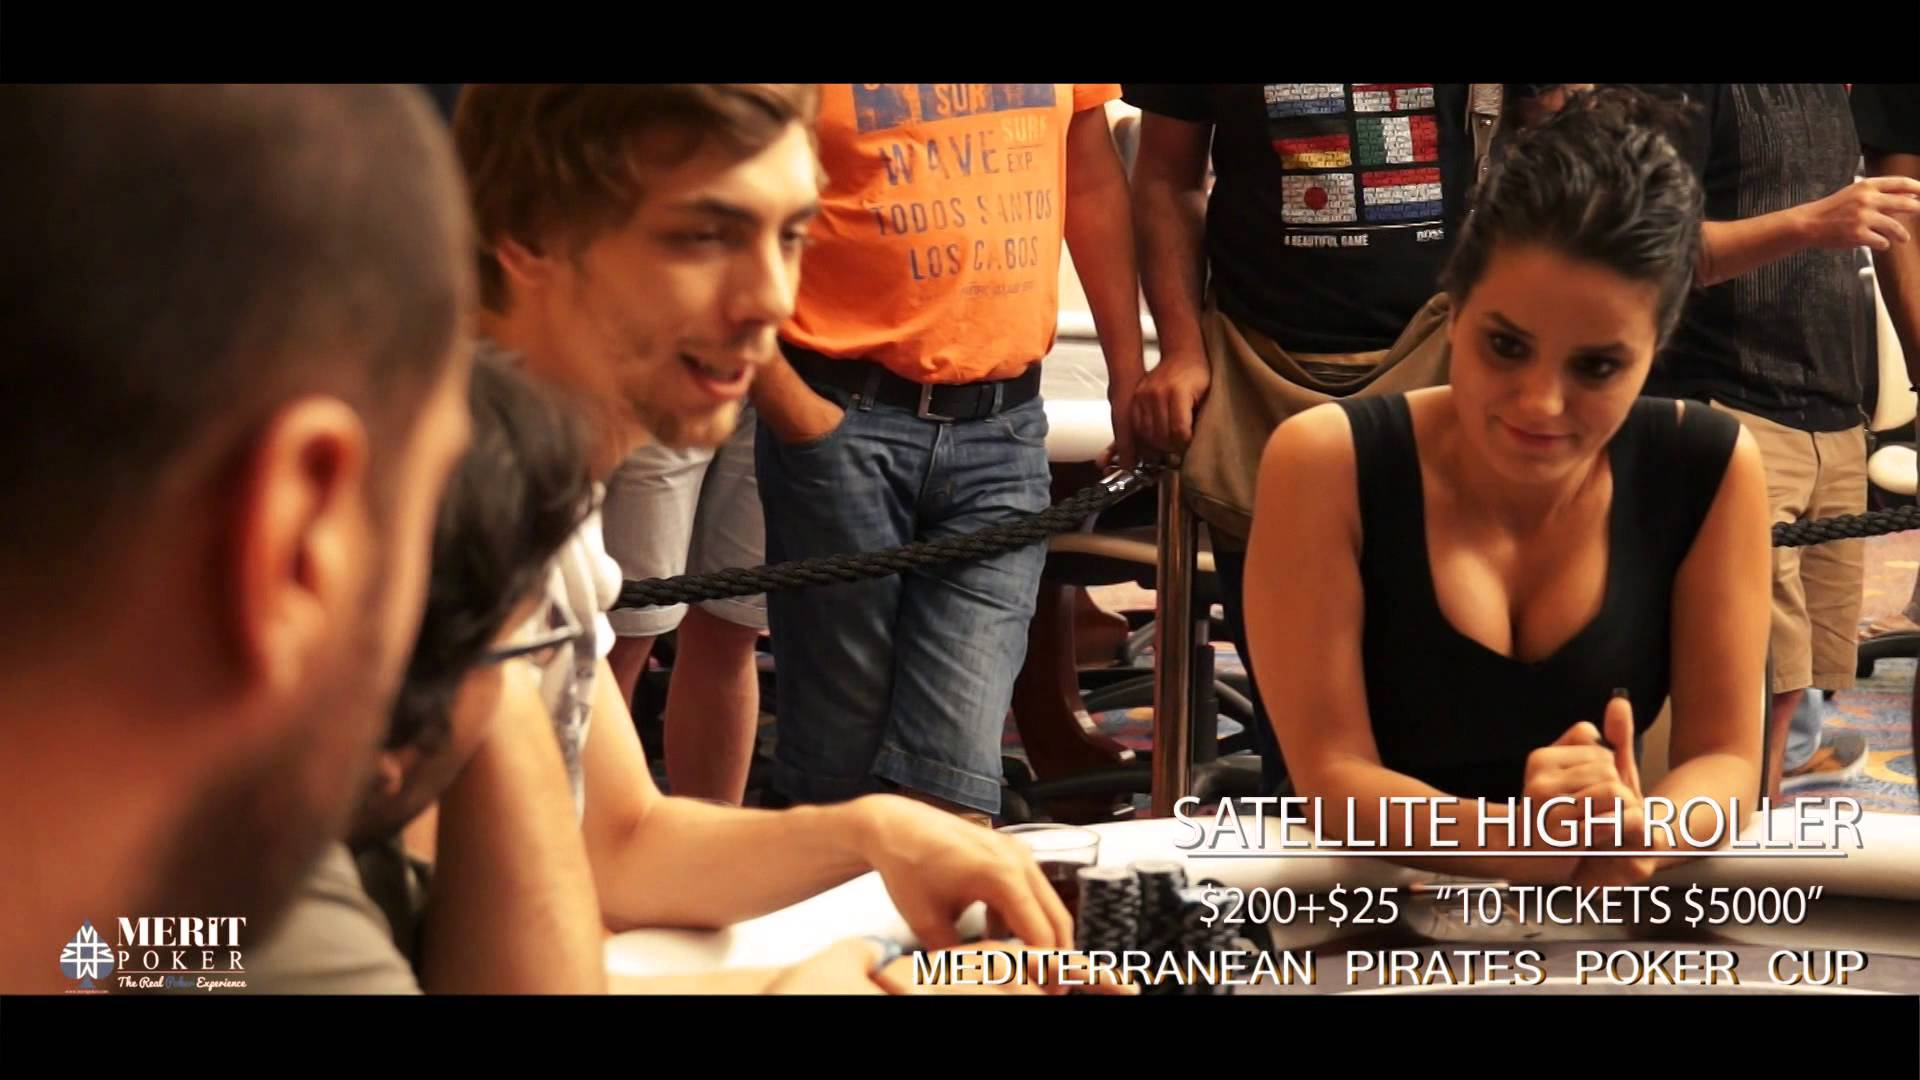 Mediterranean Pirates Poker Cup «Satellite High Roller»